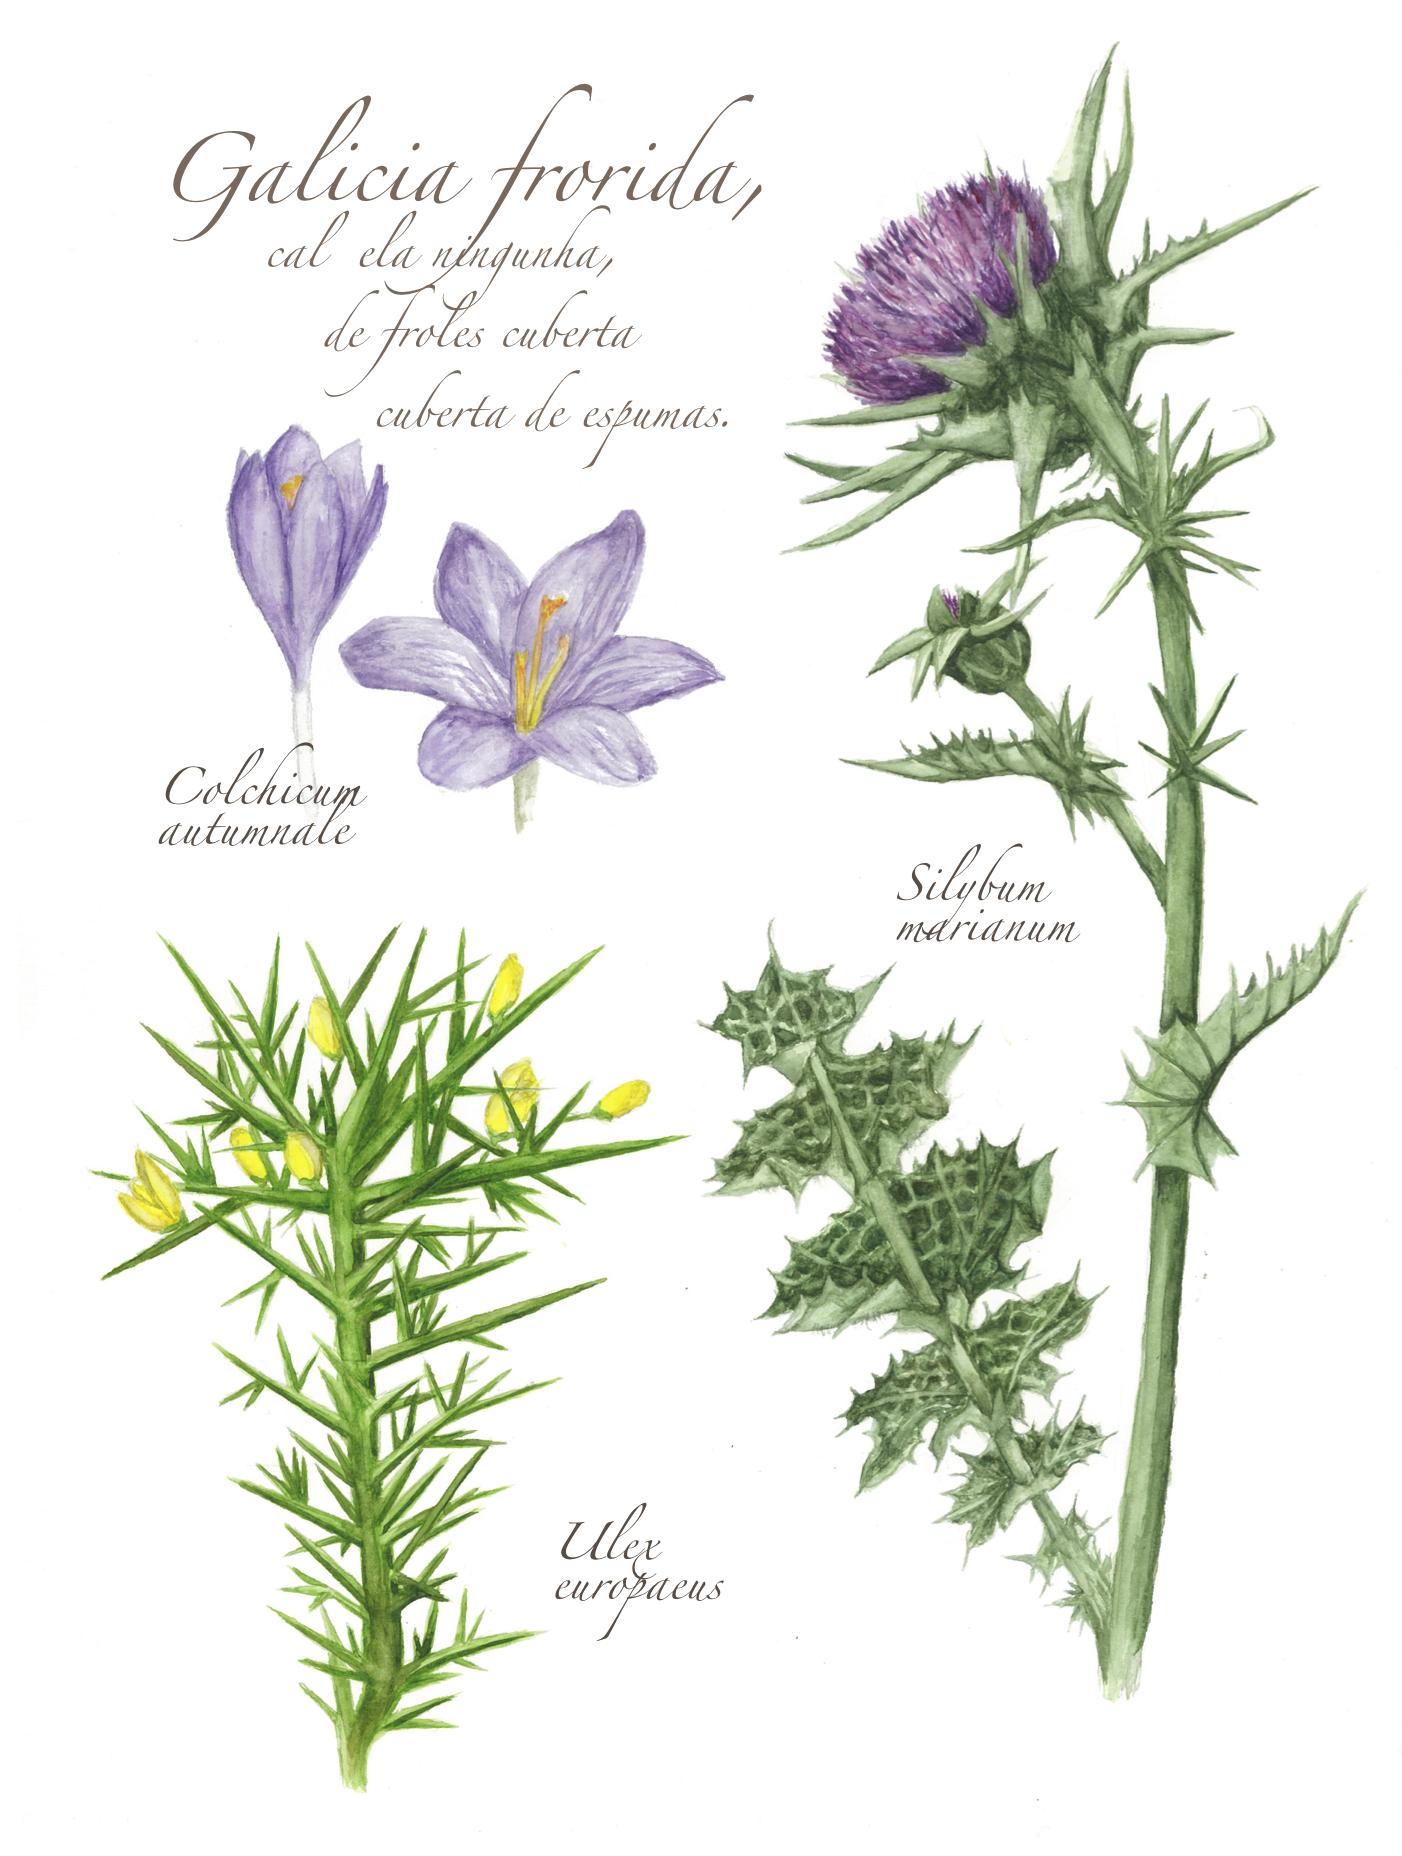 Flowers of Galicia